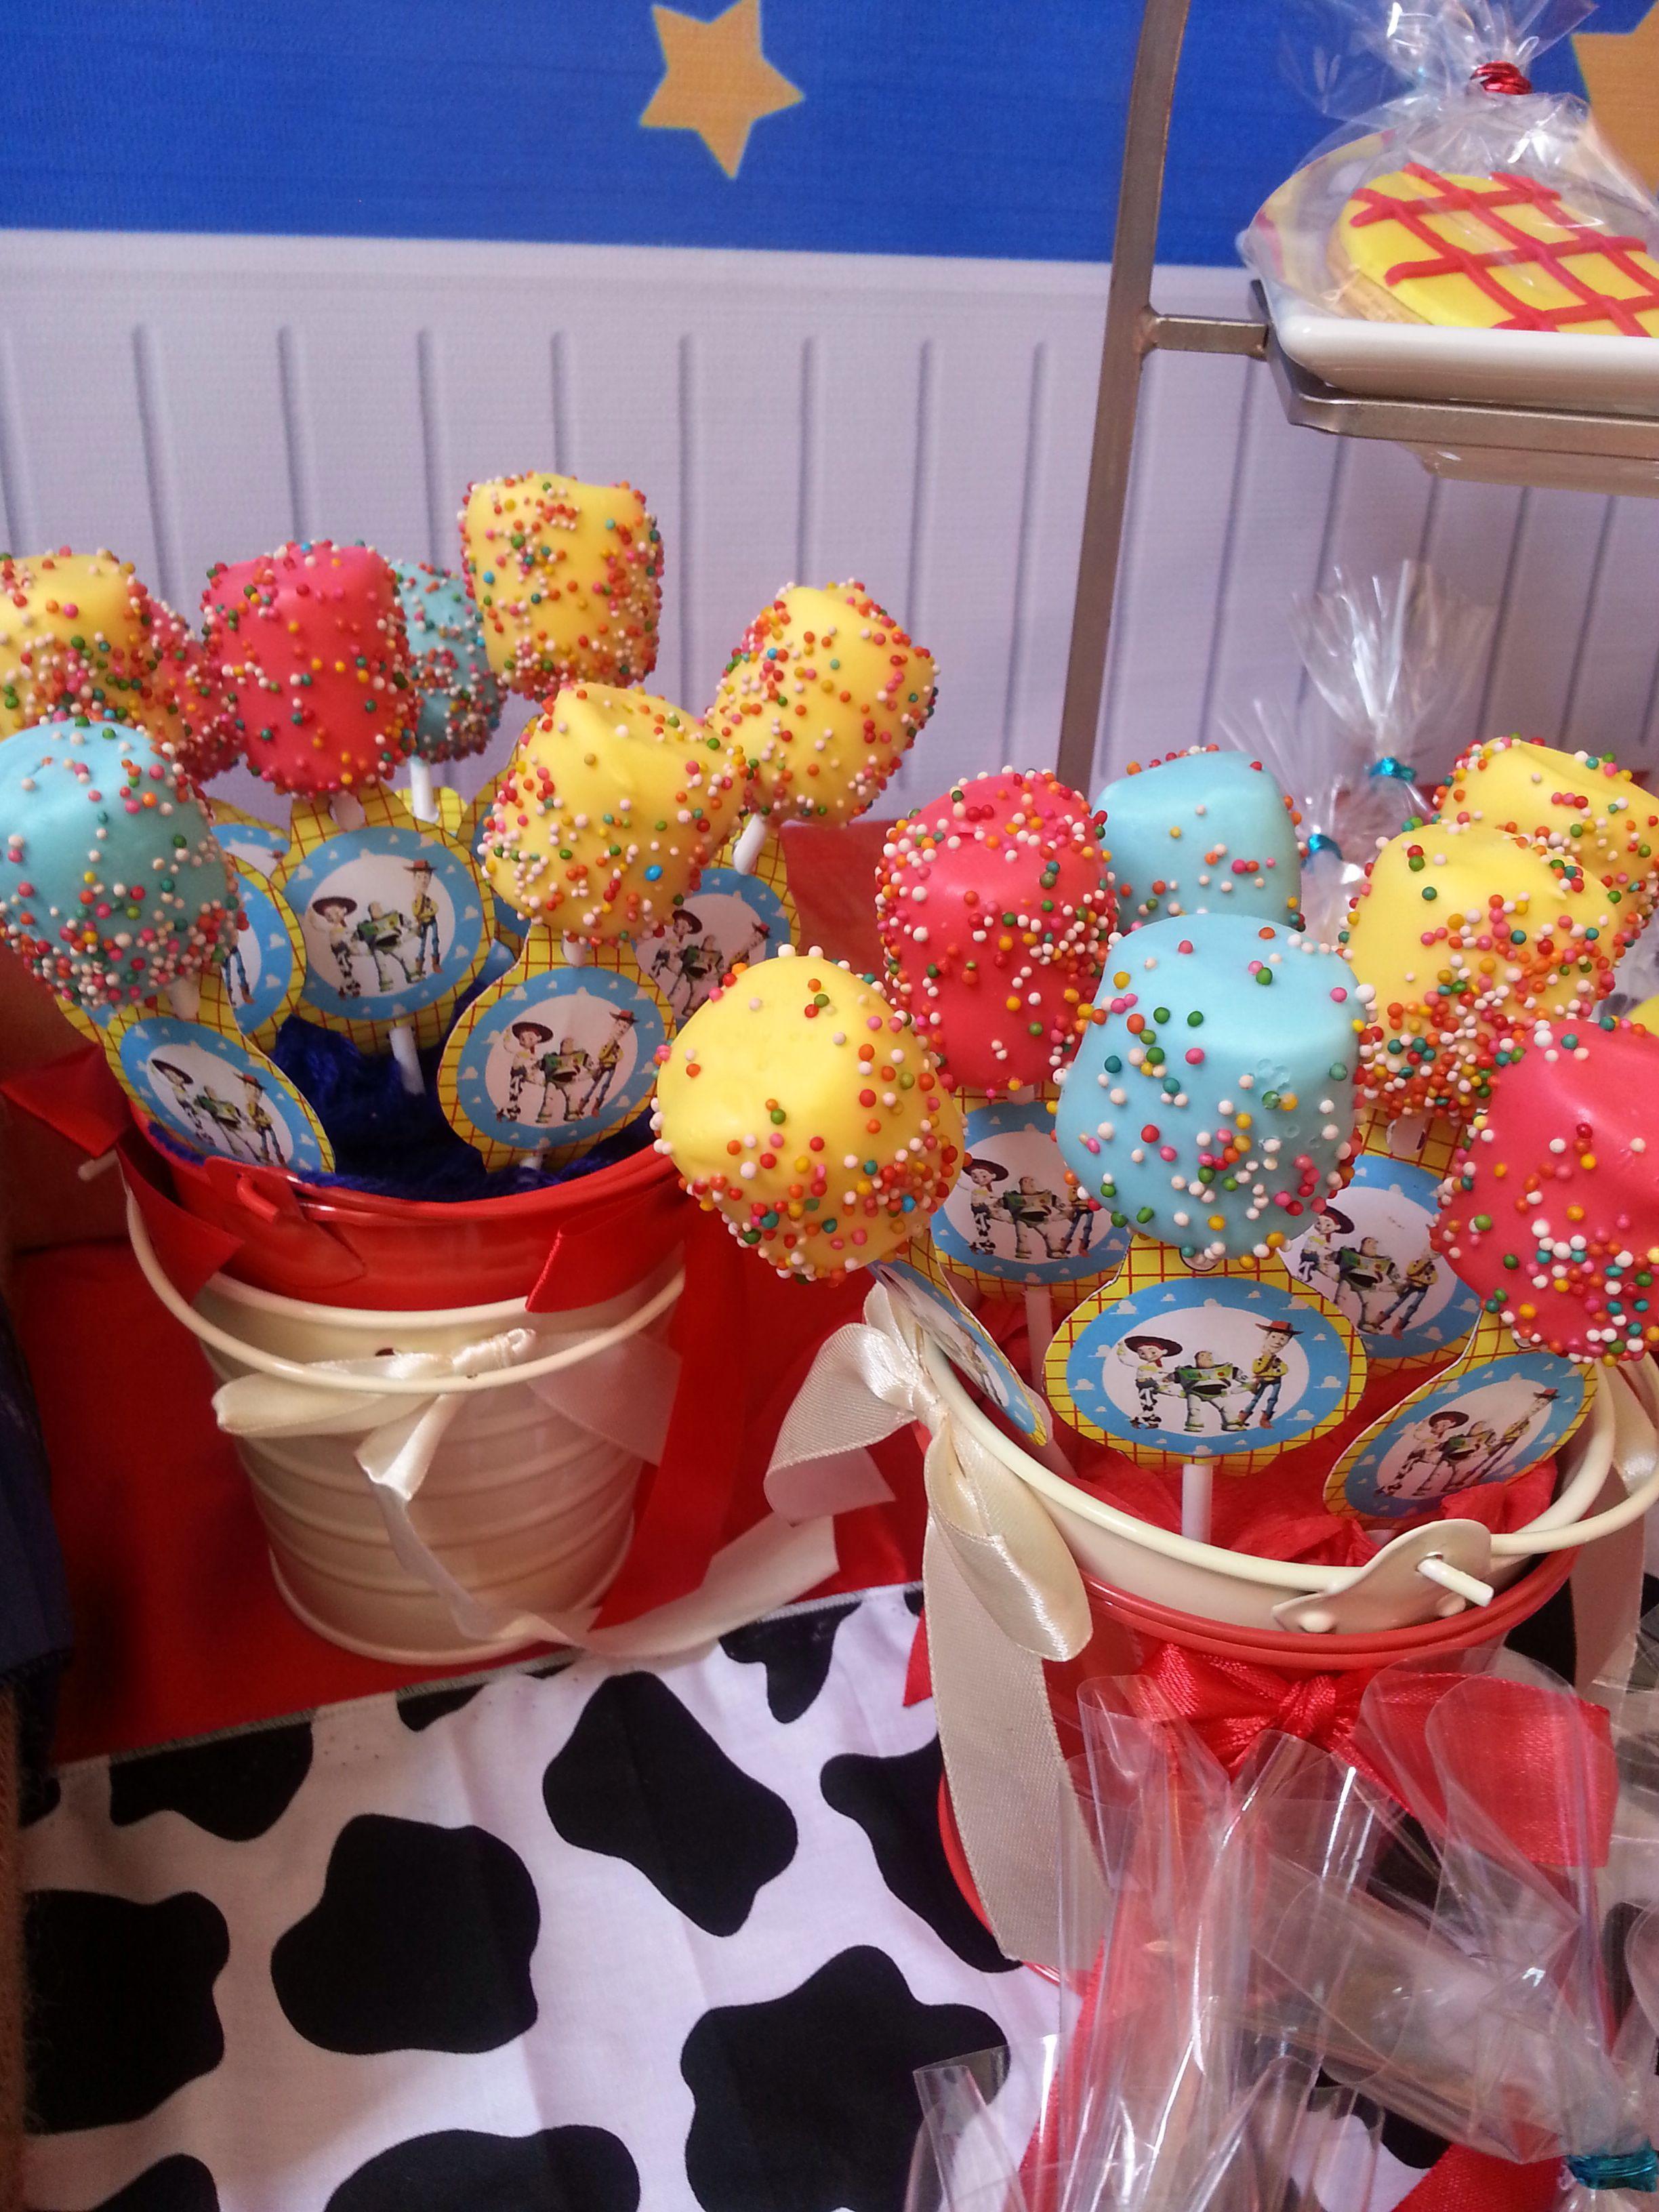 Toy Storycake pop Toy story party decorations, Toy